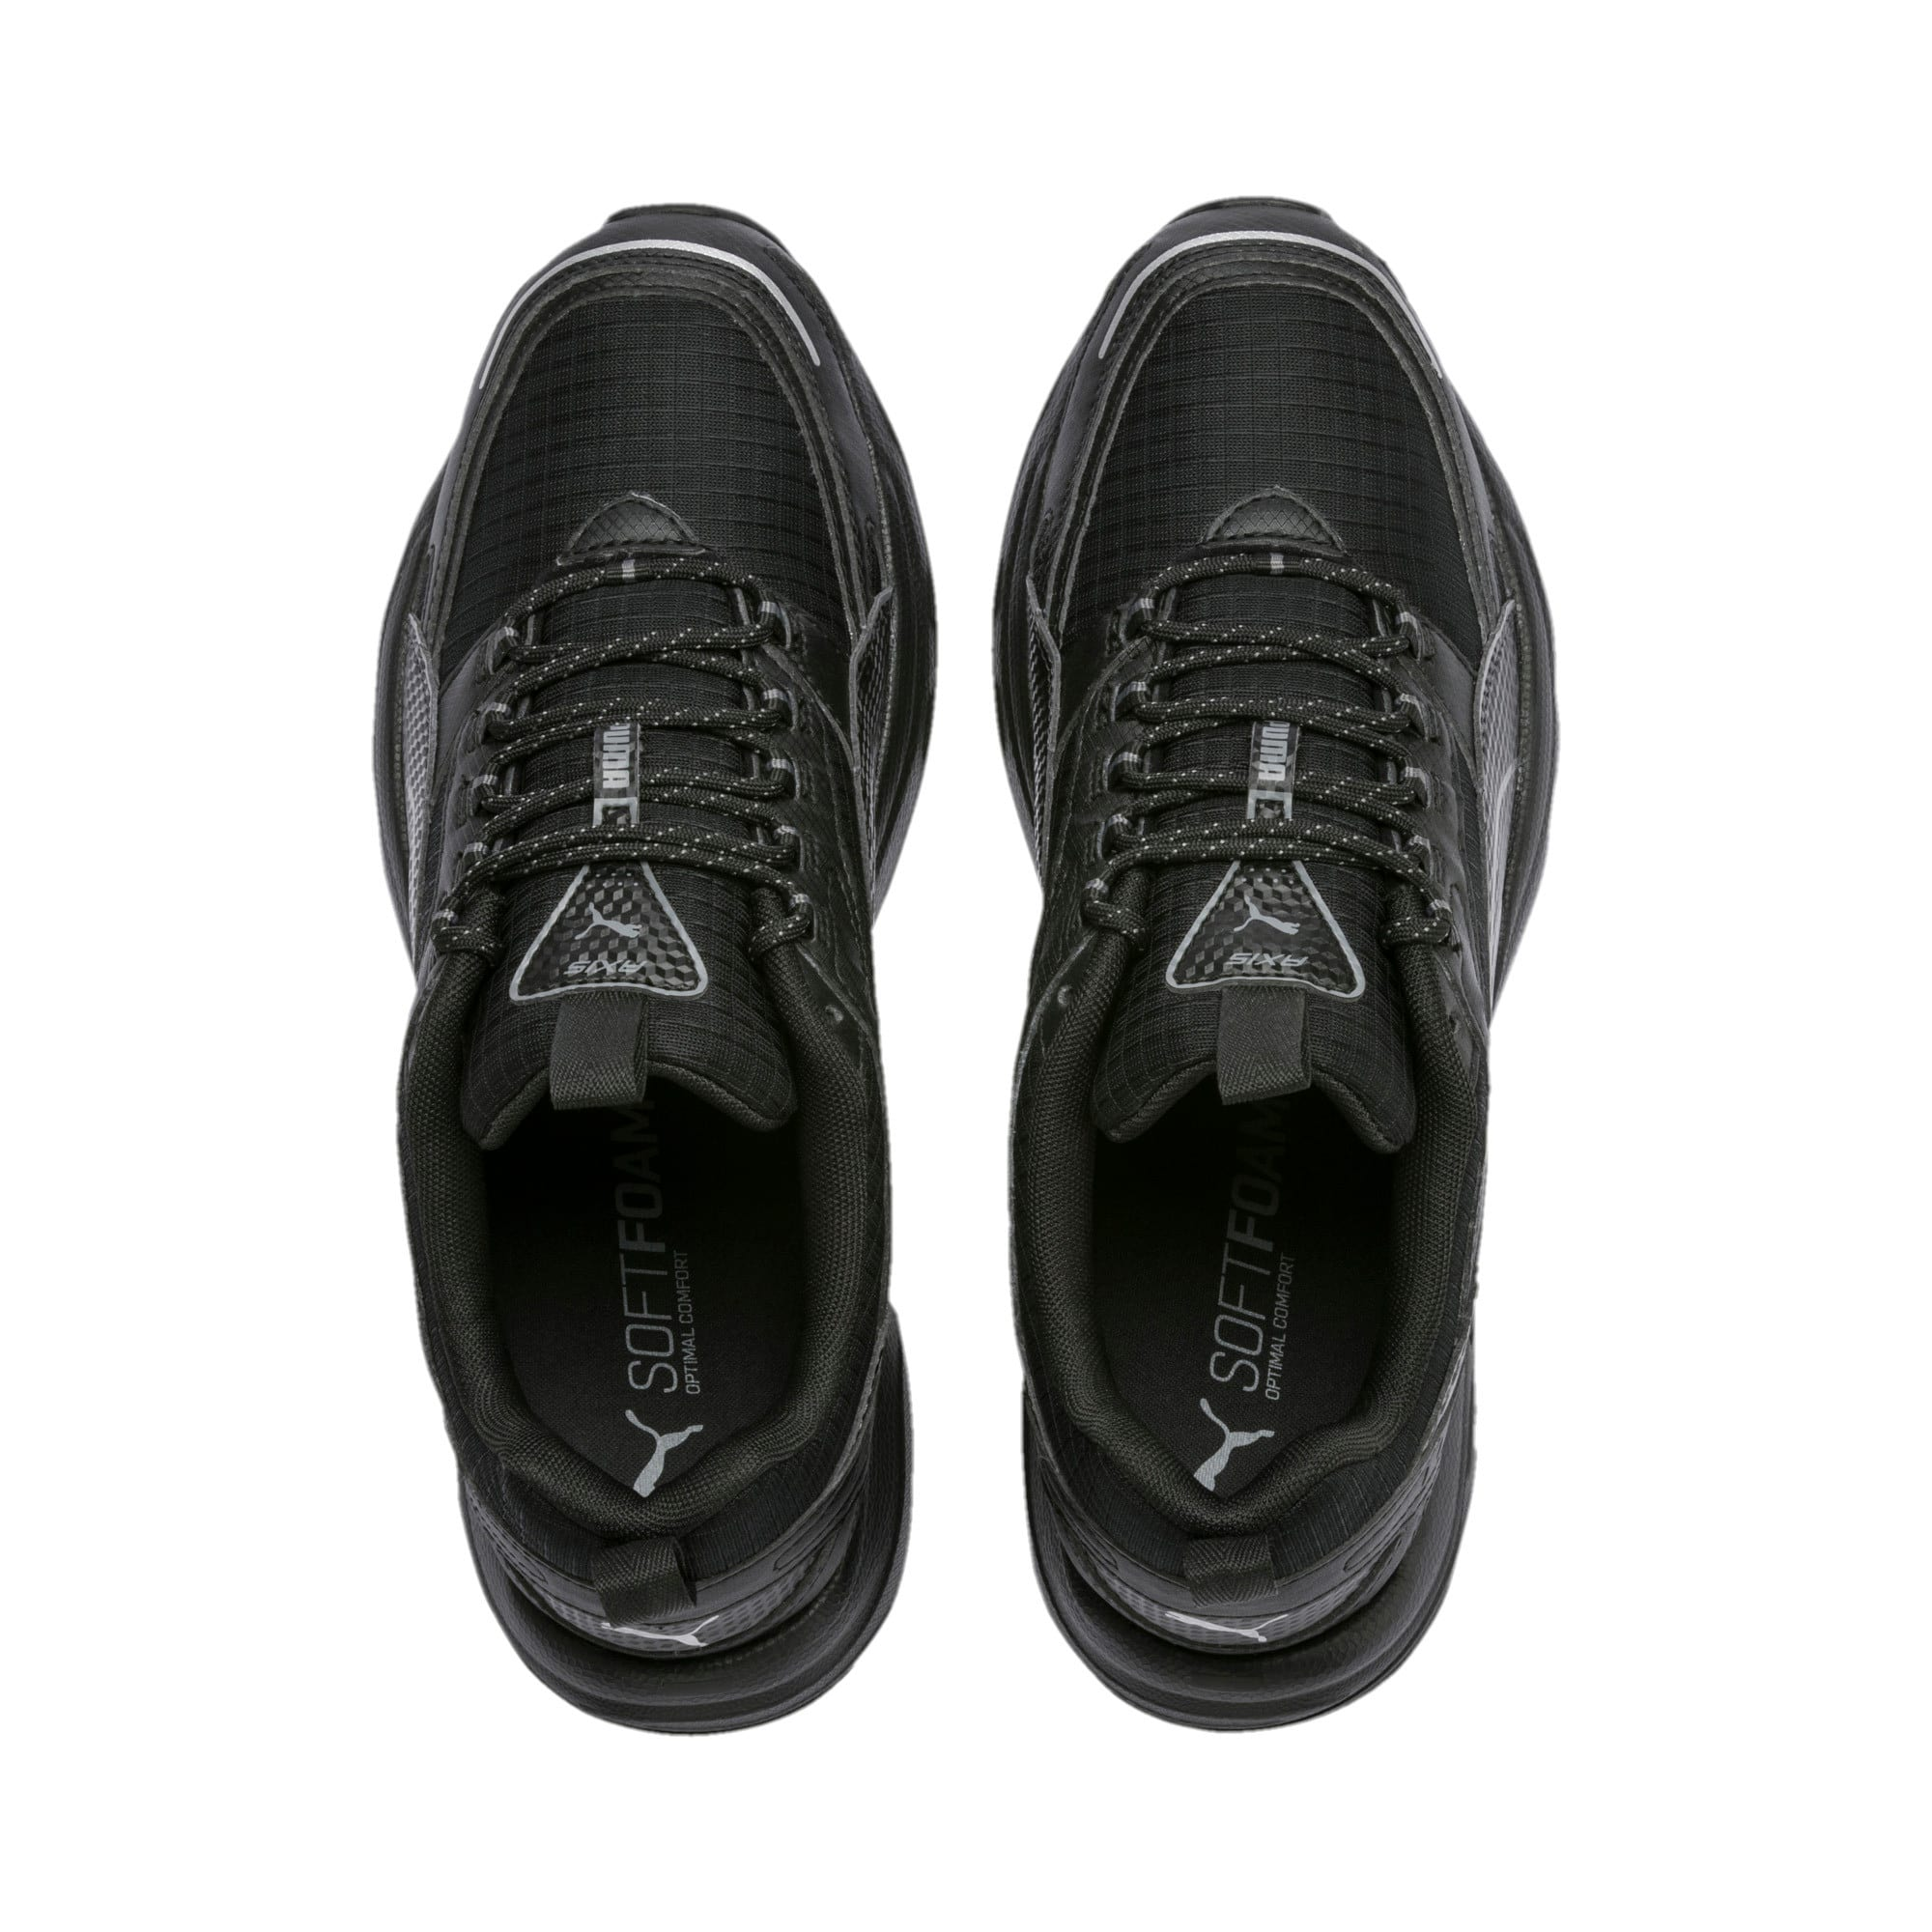 Thumbnail 7 of Axis Trail Sneakers, Puma Black-CASTLEROCK-Silver, medium